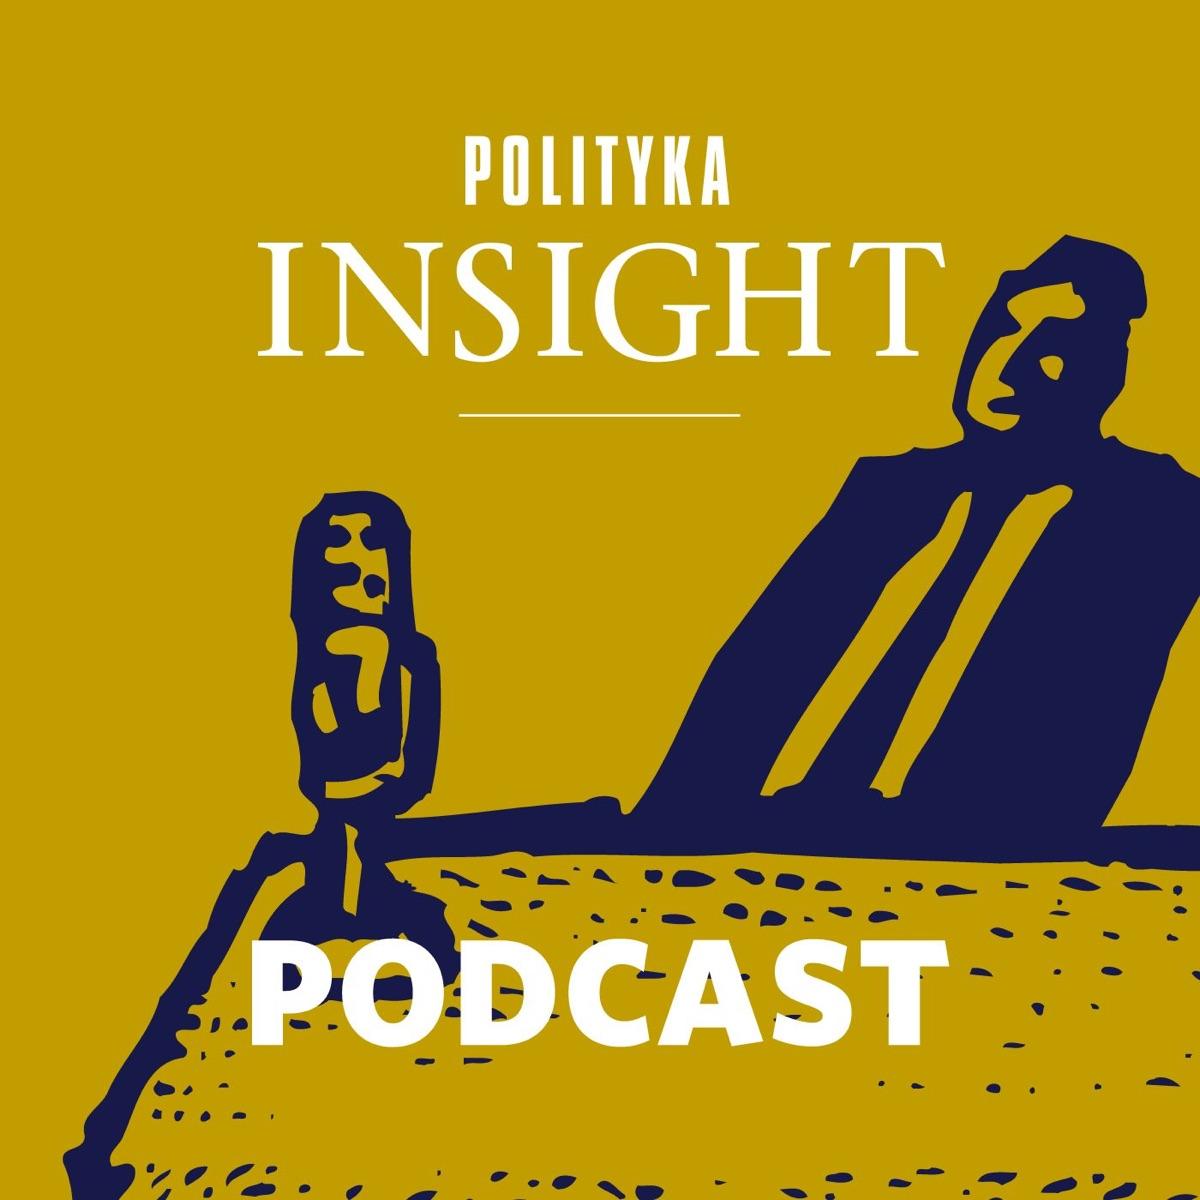 Polityka Insight Podcast